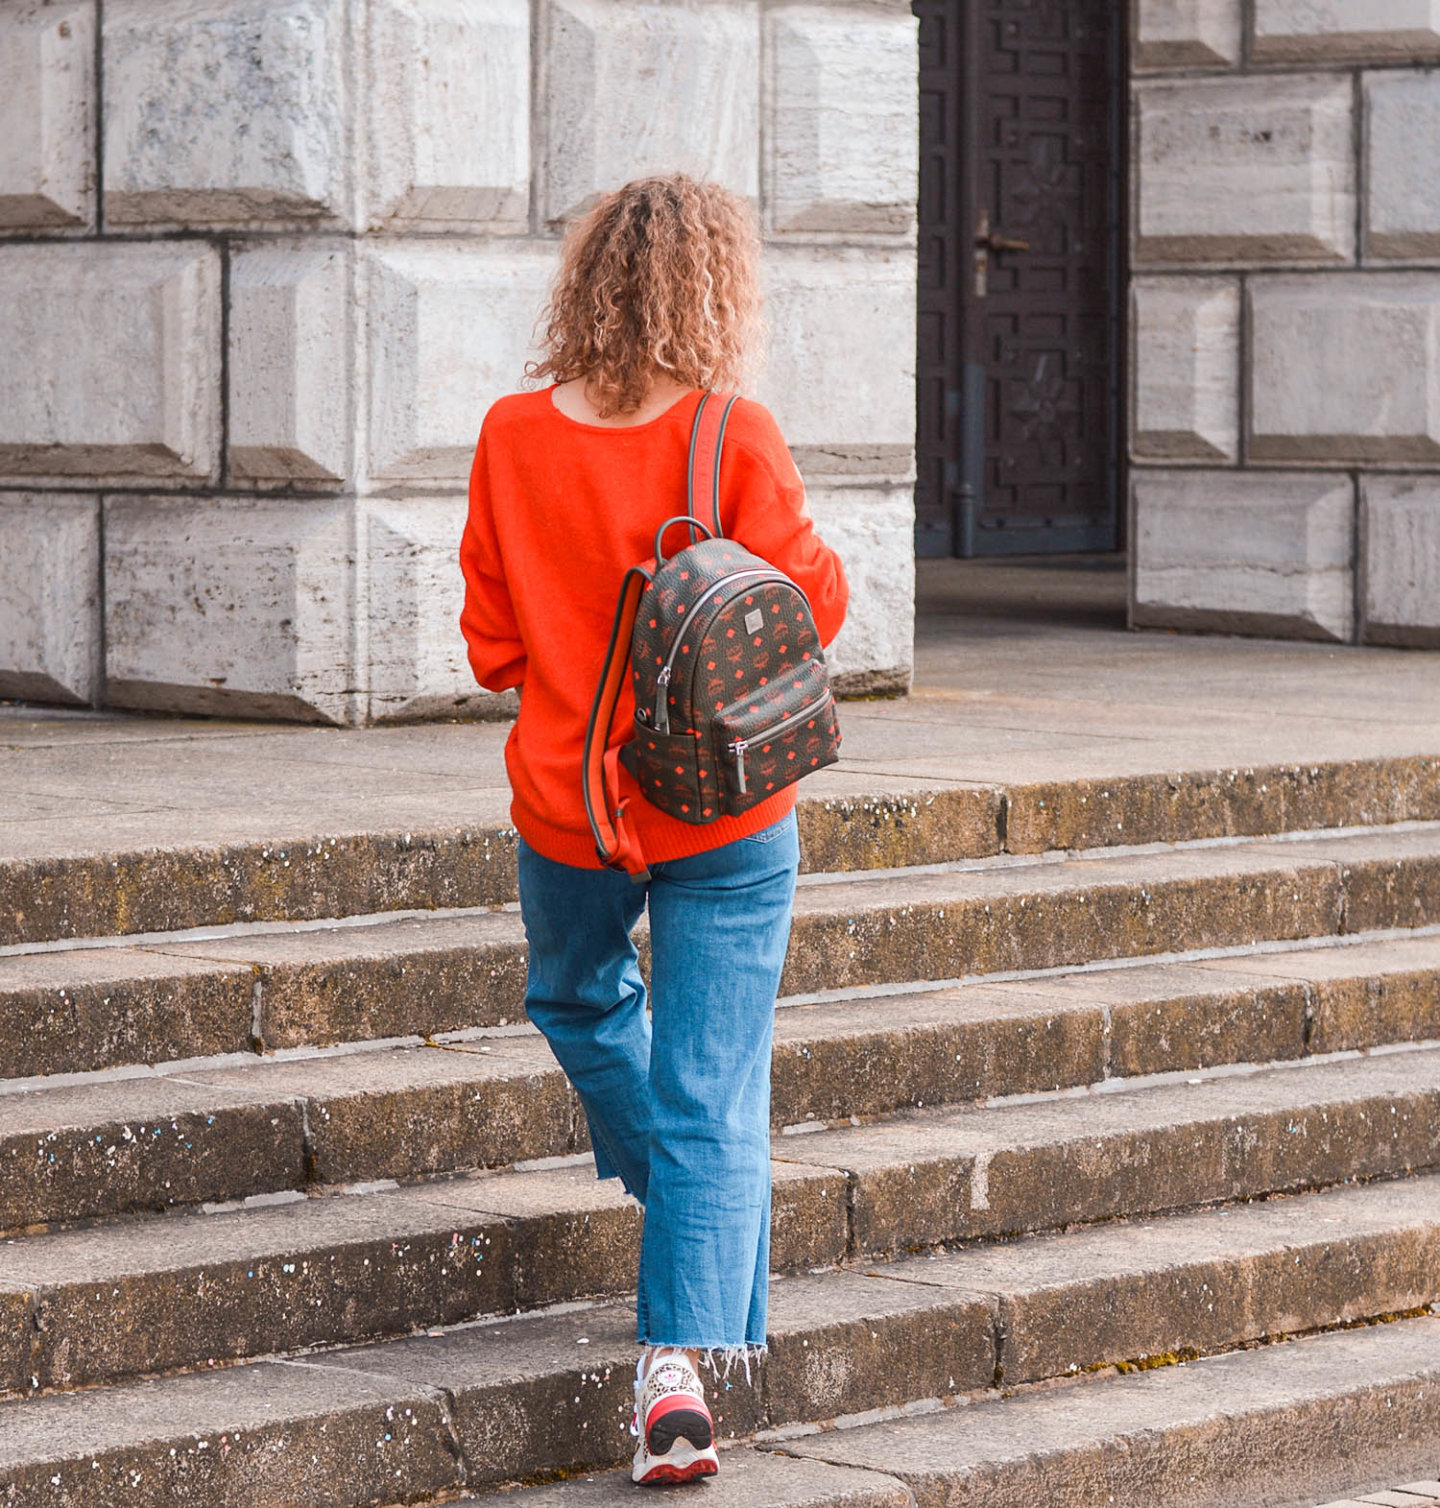 frühlingsoutfit mit signalfarbe rot und mcm-rucksack